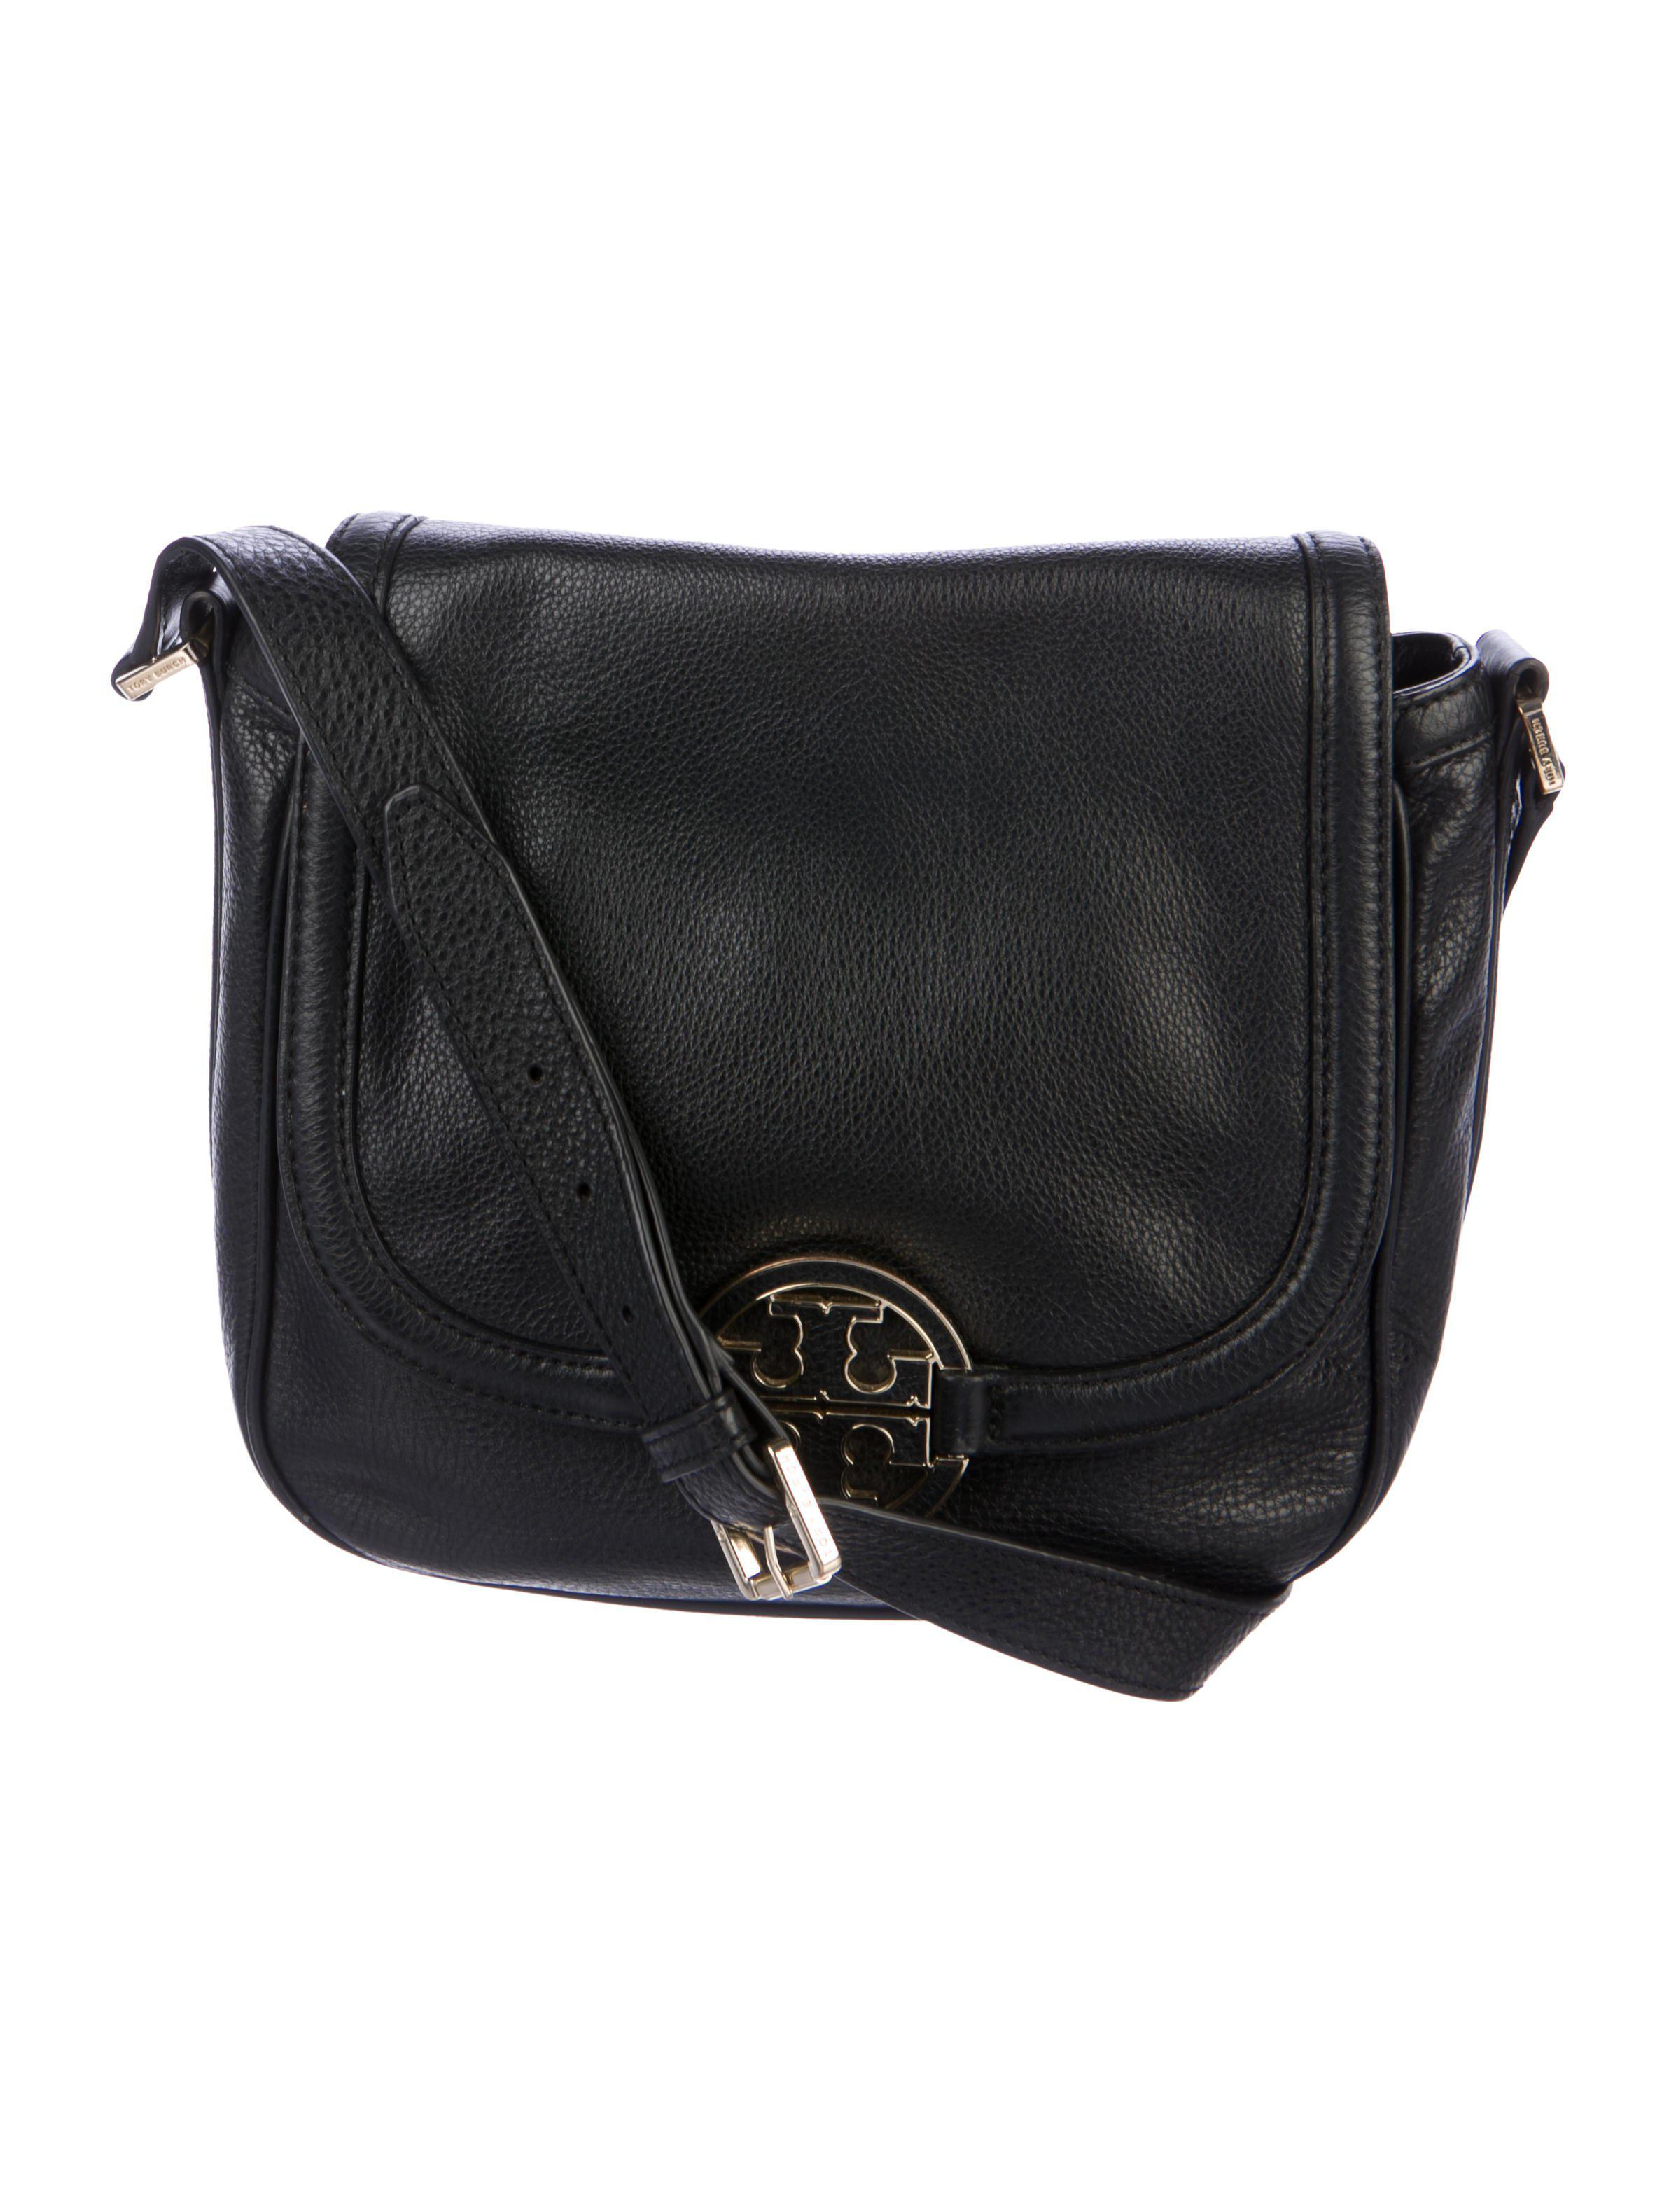 4bc1859560c2 Lyst - Tory Burch Amanda Crossbody Bag Black in Metallic